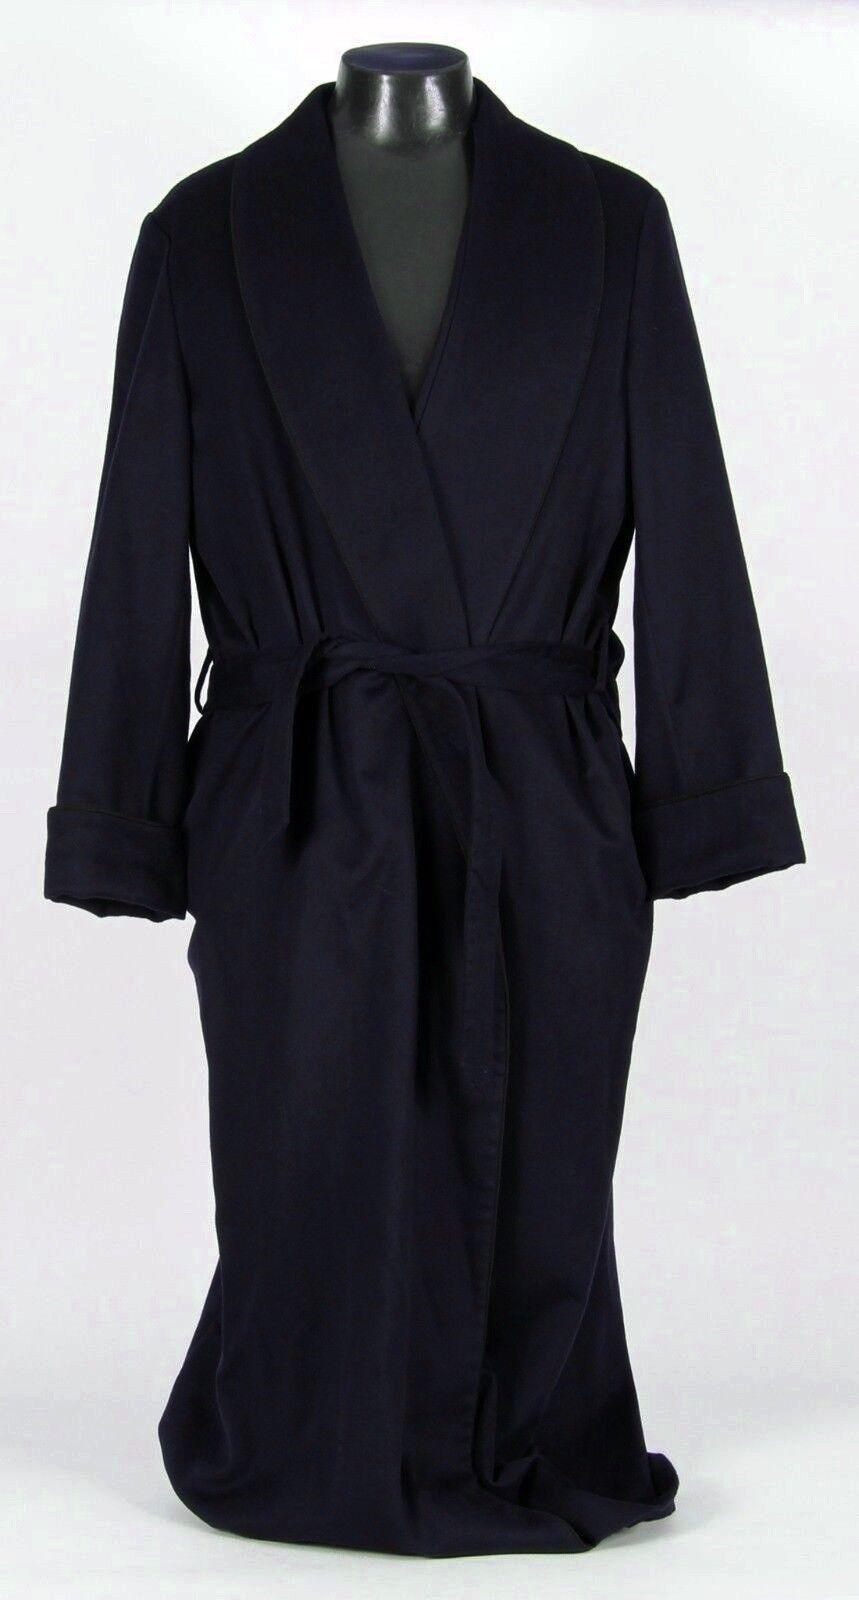 3650 - LGold PIANA 100% CASHMERE Robe - Blau - XL